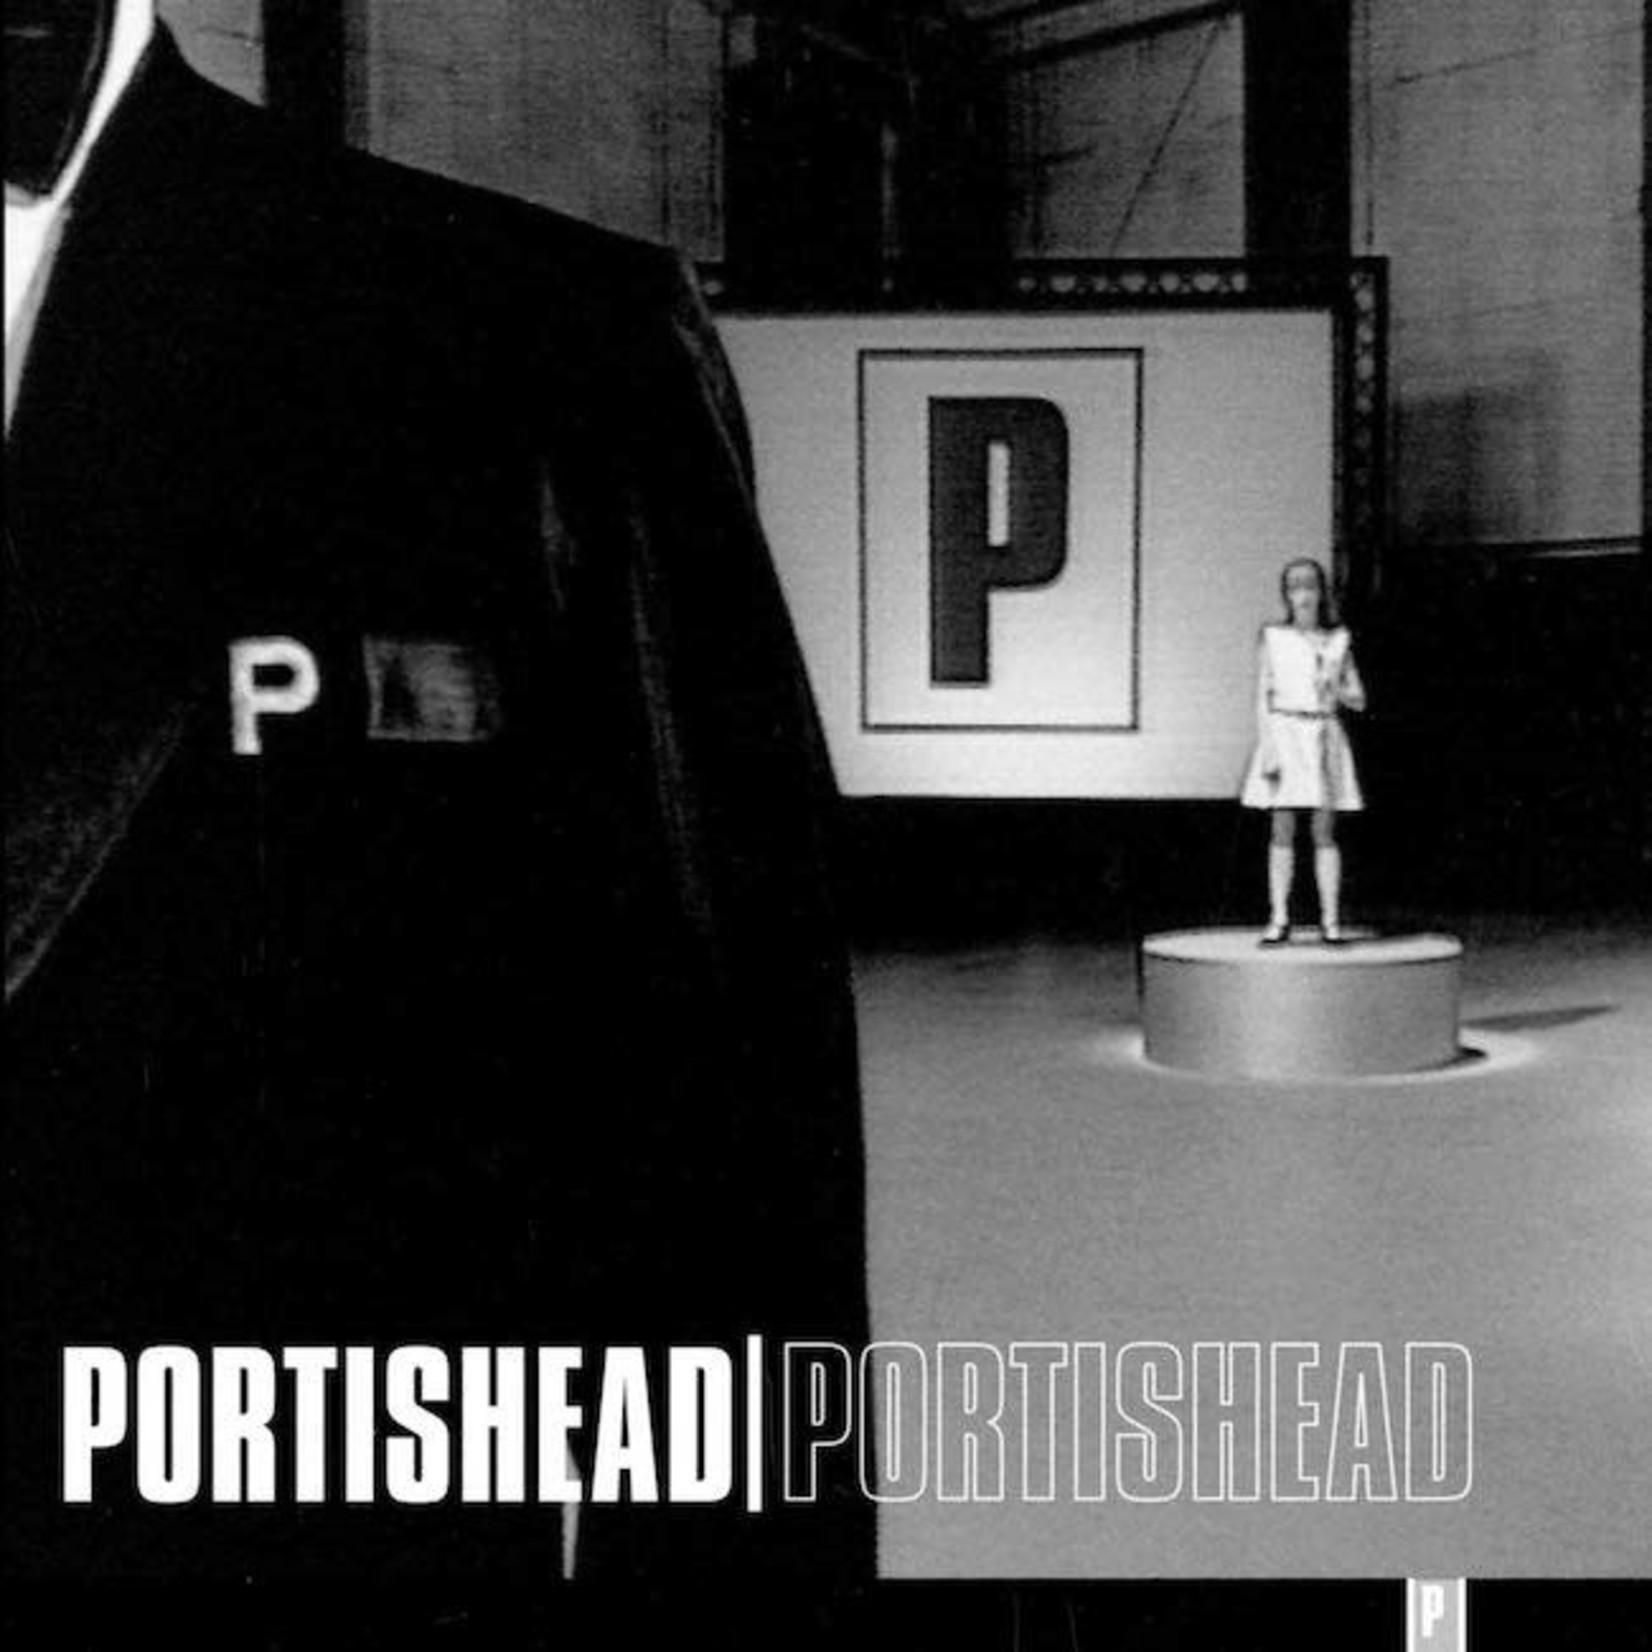 [New] Portishead: self-titled (2LP, European Ed.)